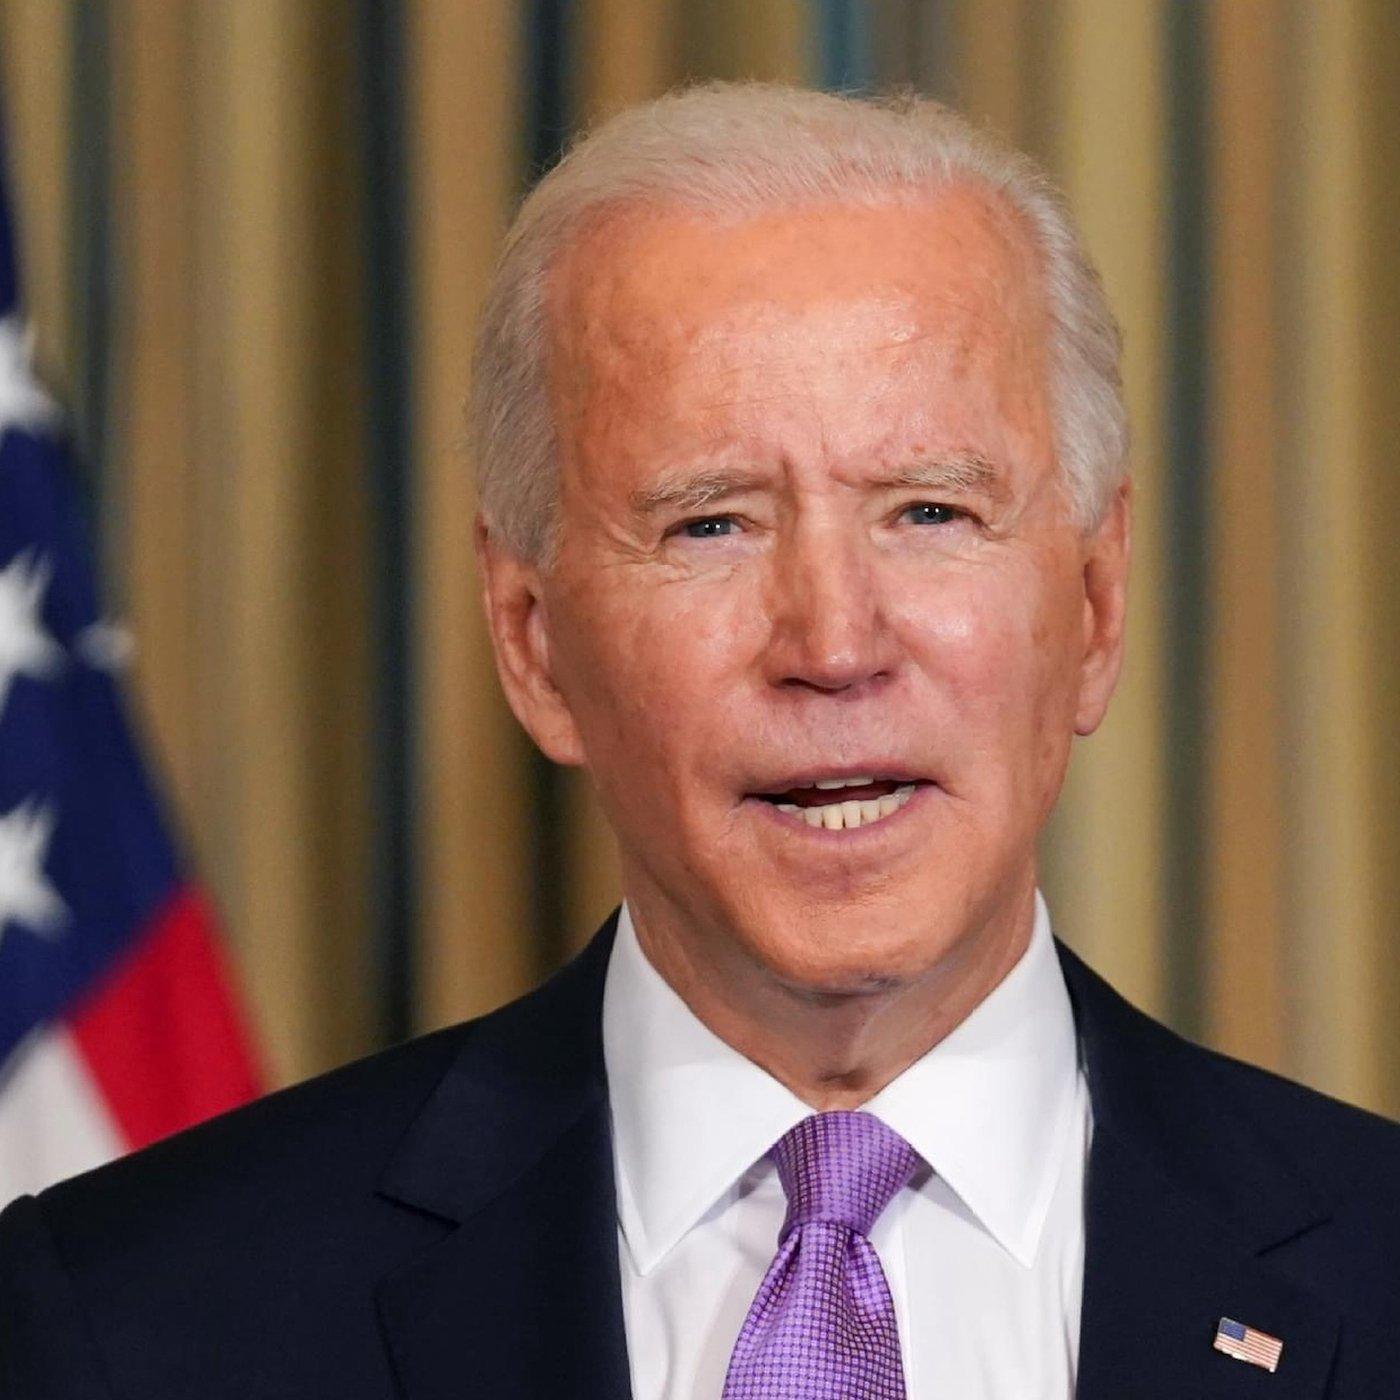 Listen: Biden's Big Address: 3 Things to Know